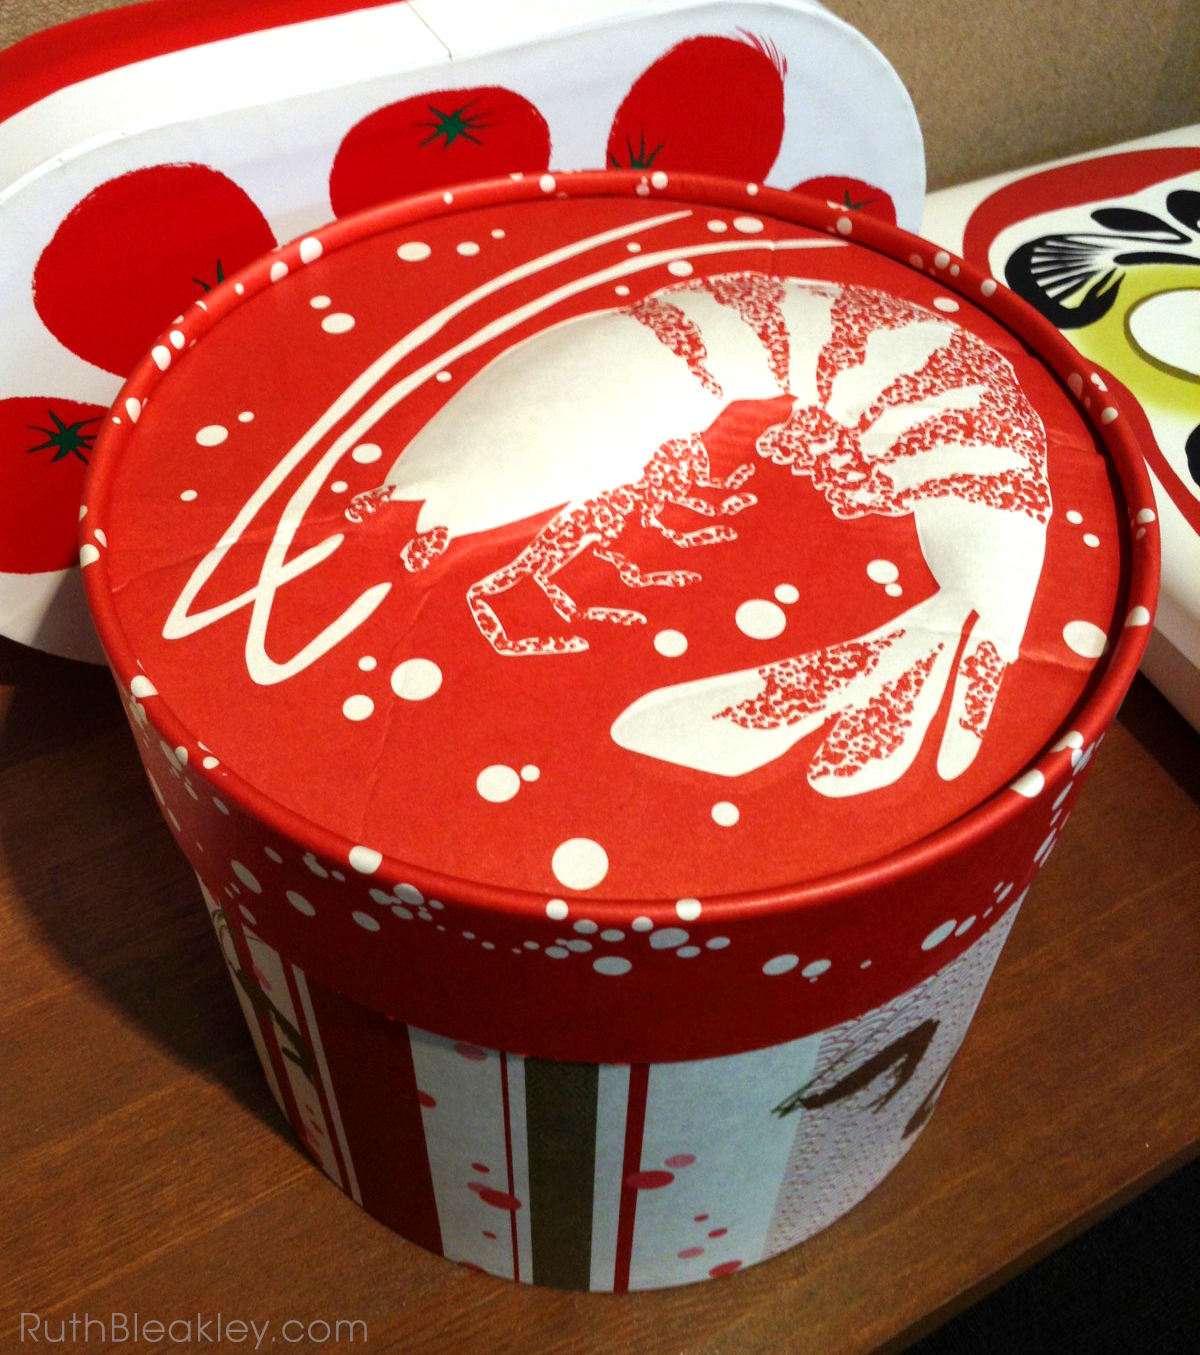 Ruth visits Suzuki Shofudo in Kyoto Japan for Katazome Washi Paper - Ebi Shrimp Box